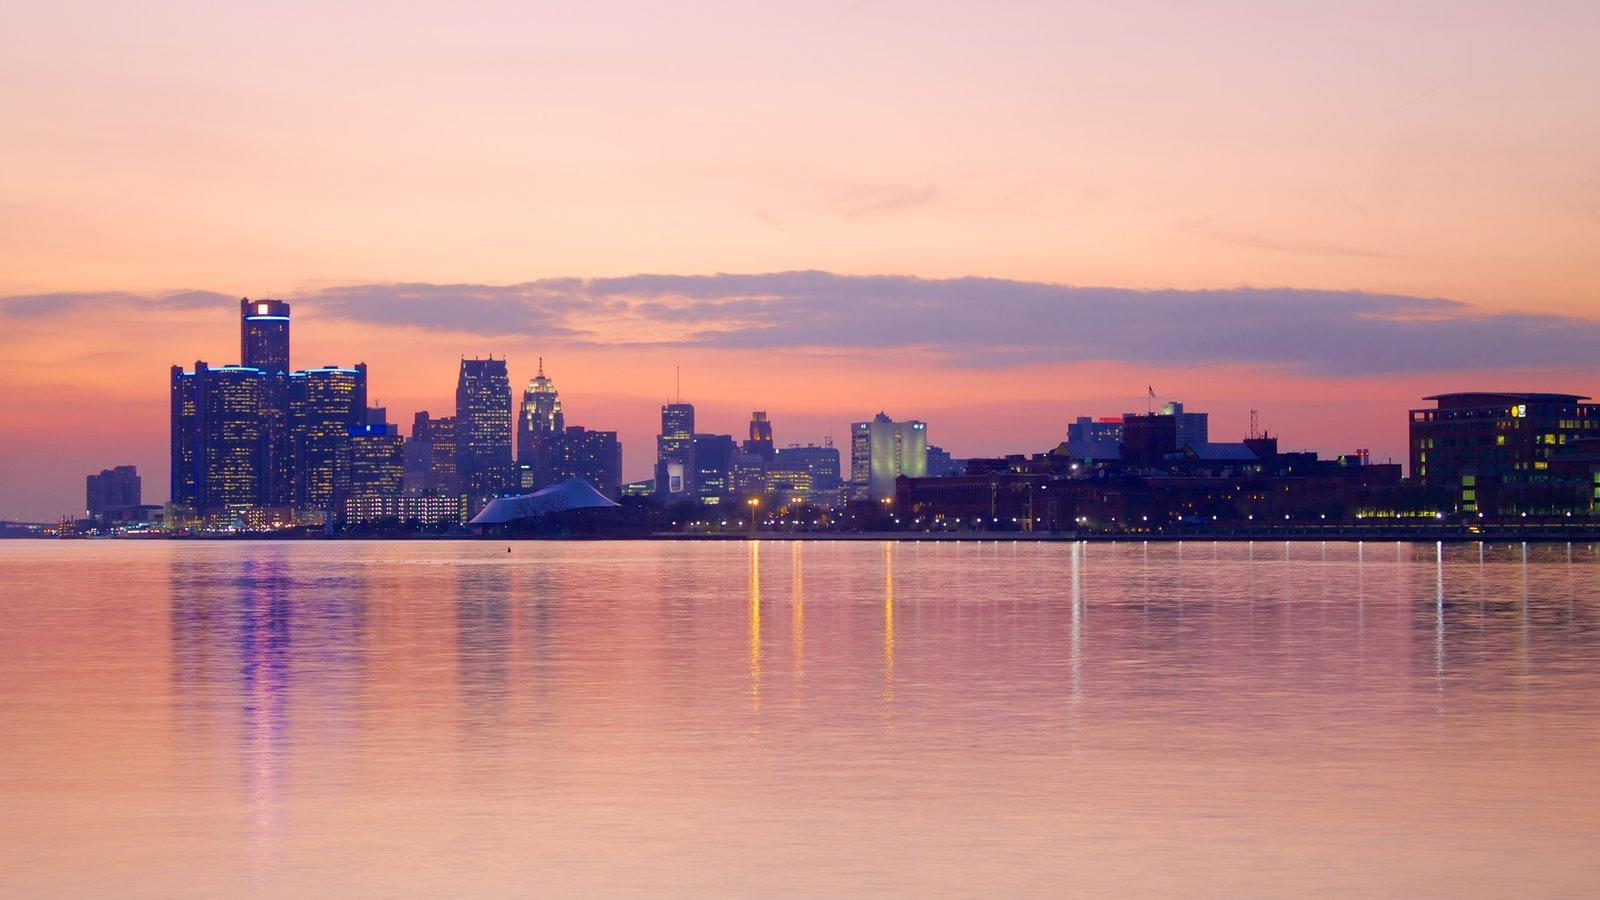 Detroit caracterizando um pôr do sol, distrito comercial central e linha do horizonte